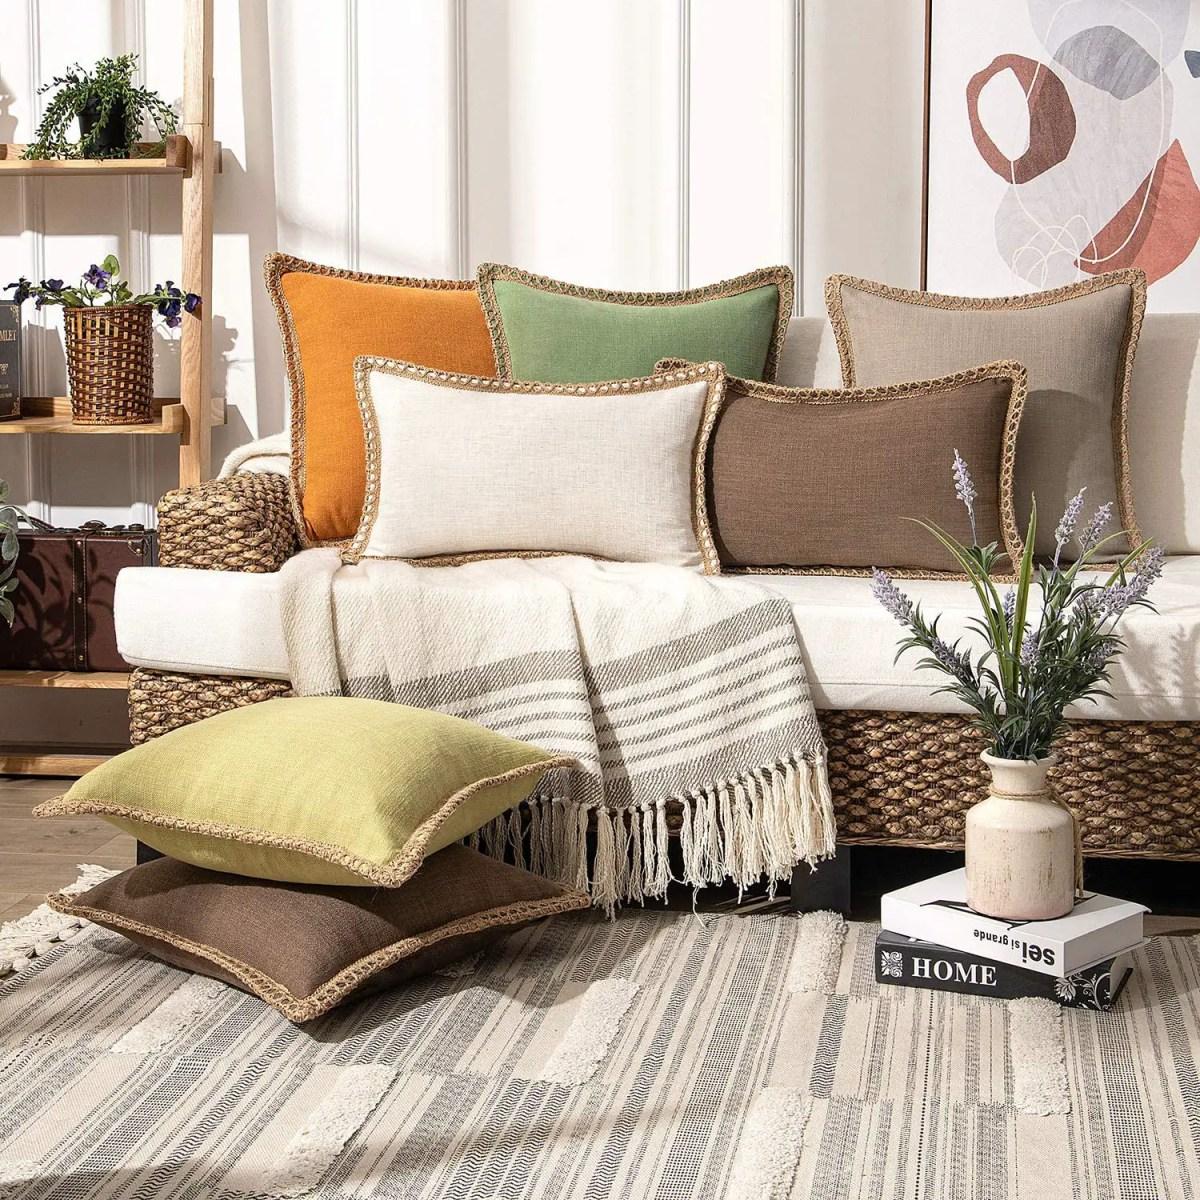 Burlap-Trimmed-Farmhouse-Pillowcases